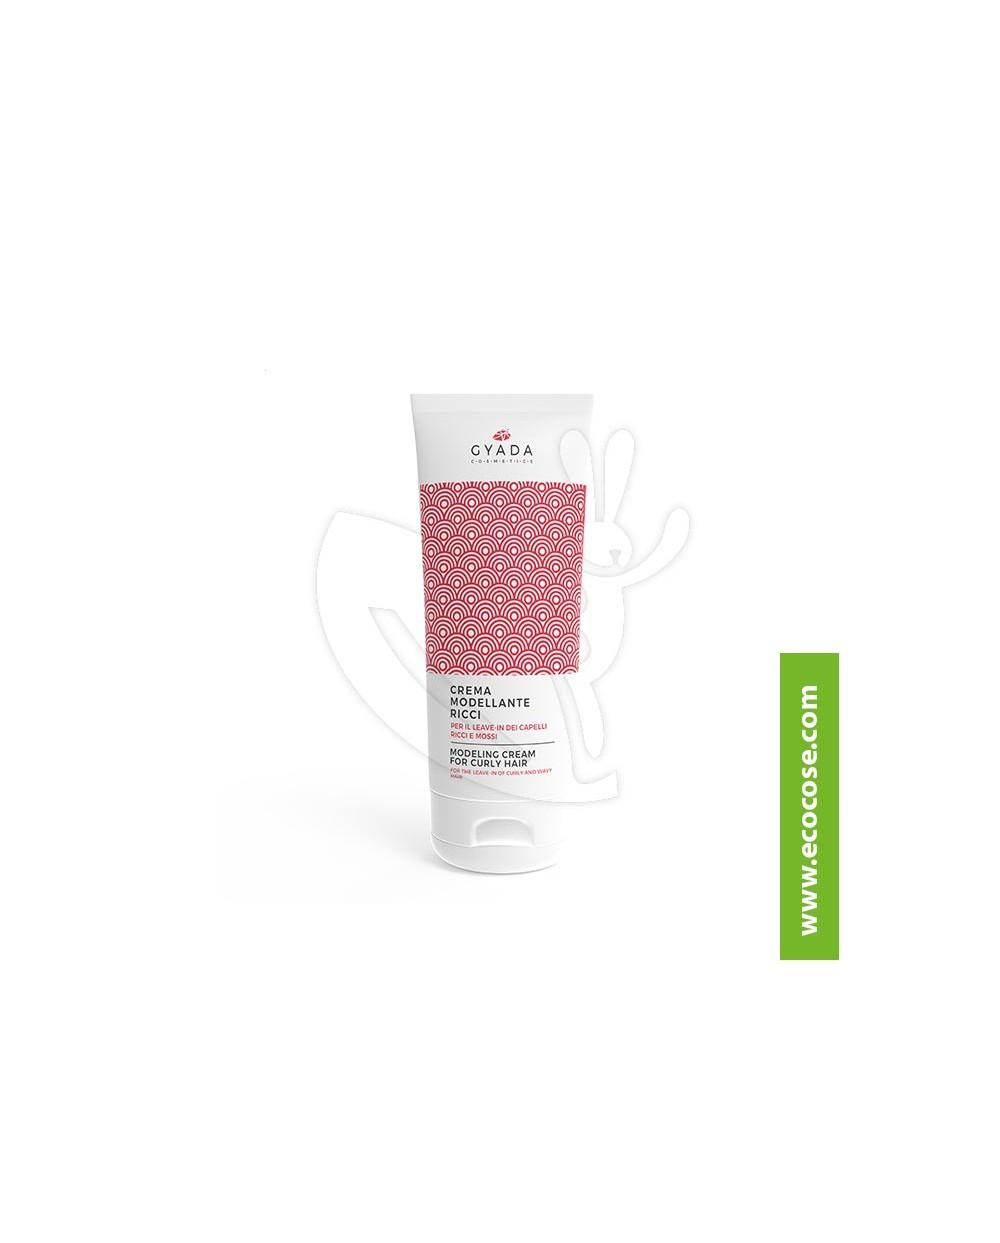 Gyada Cosmetics - Crema modellante ricci